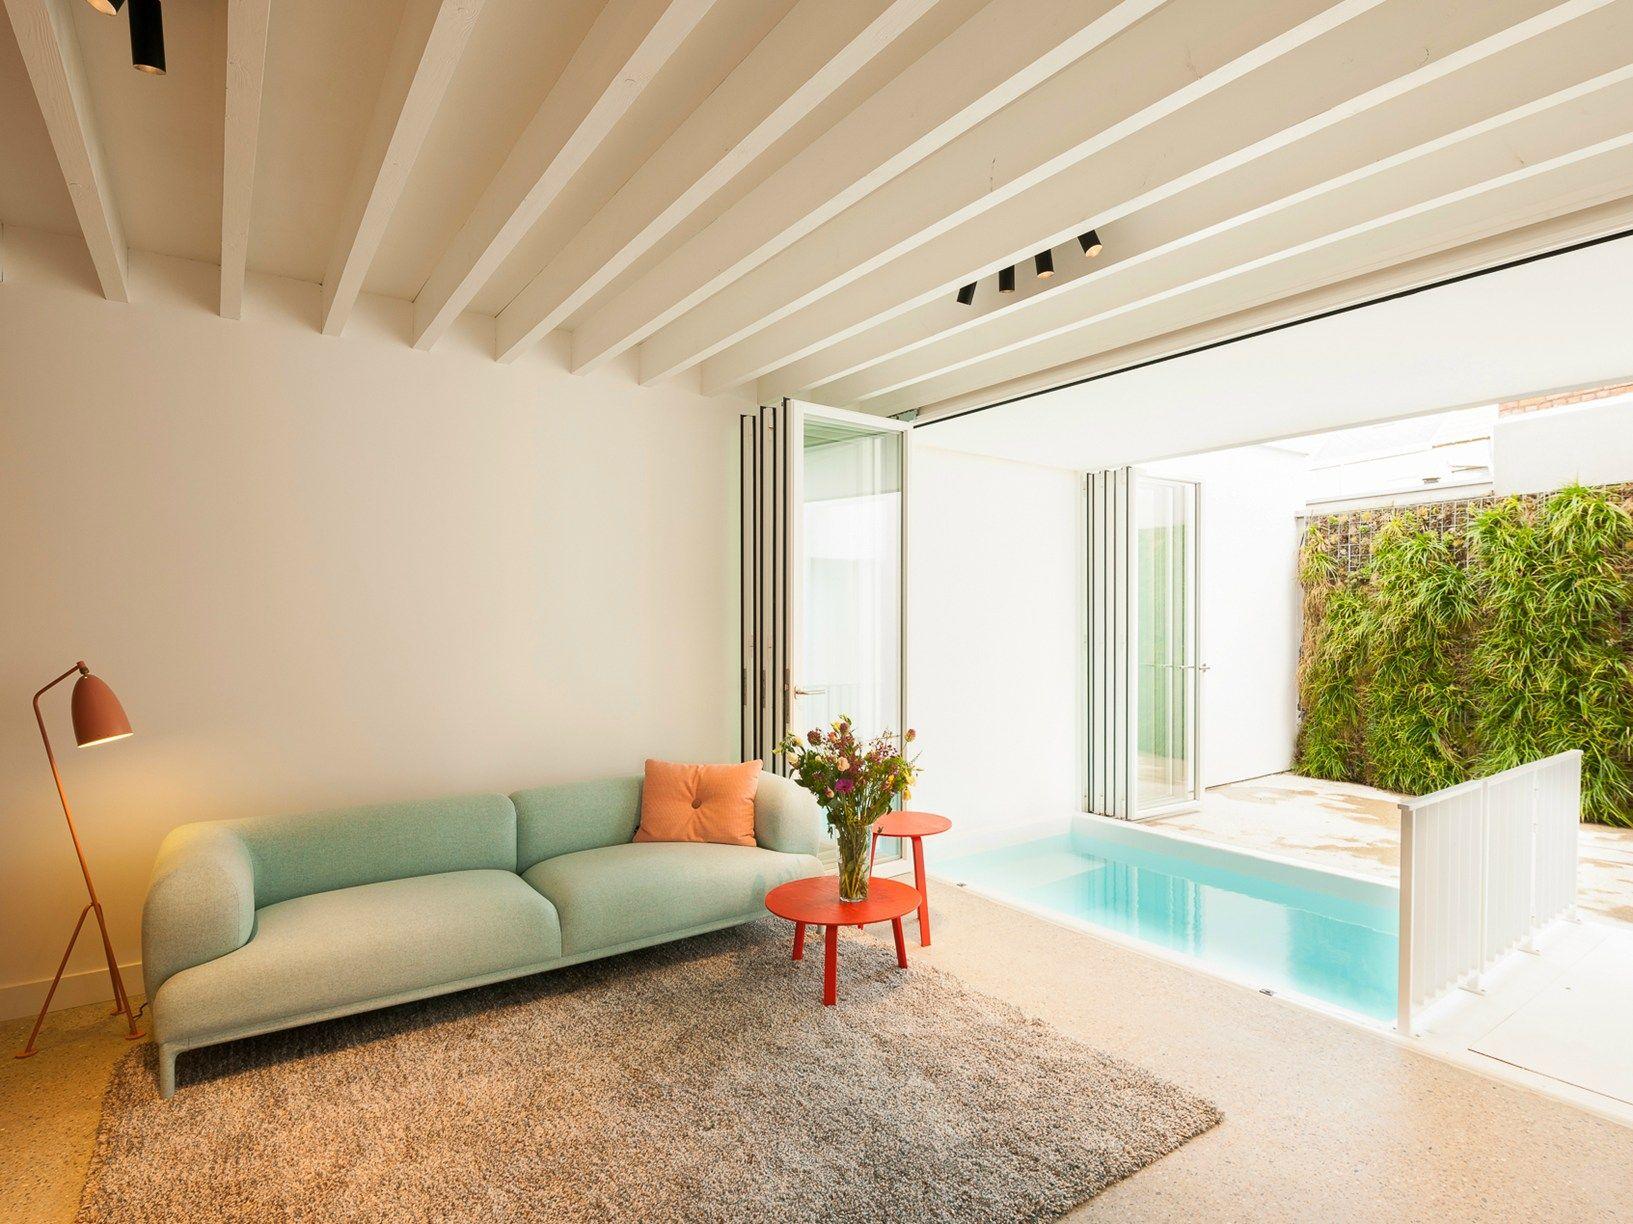 Belgio: House LKS by P8 Architecten